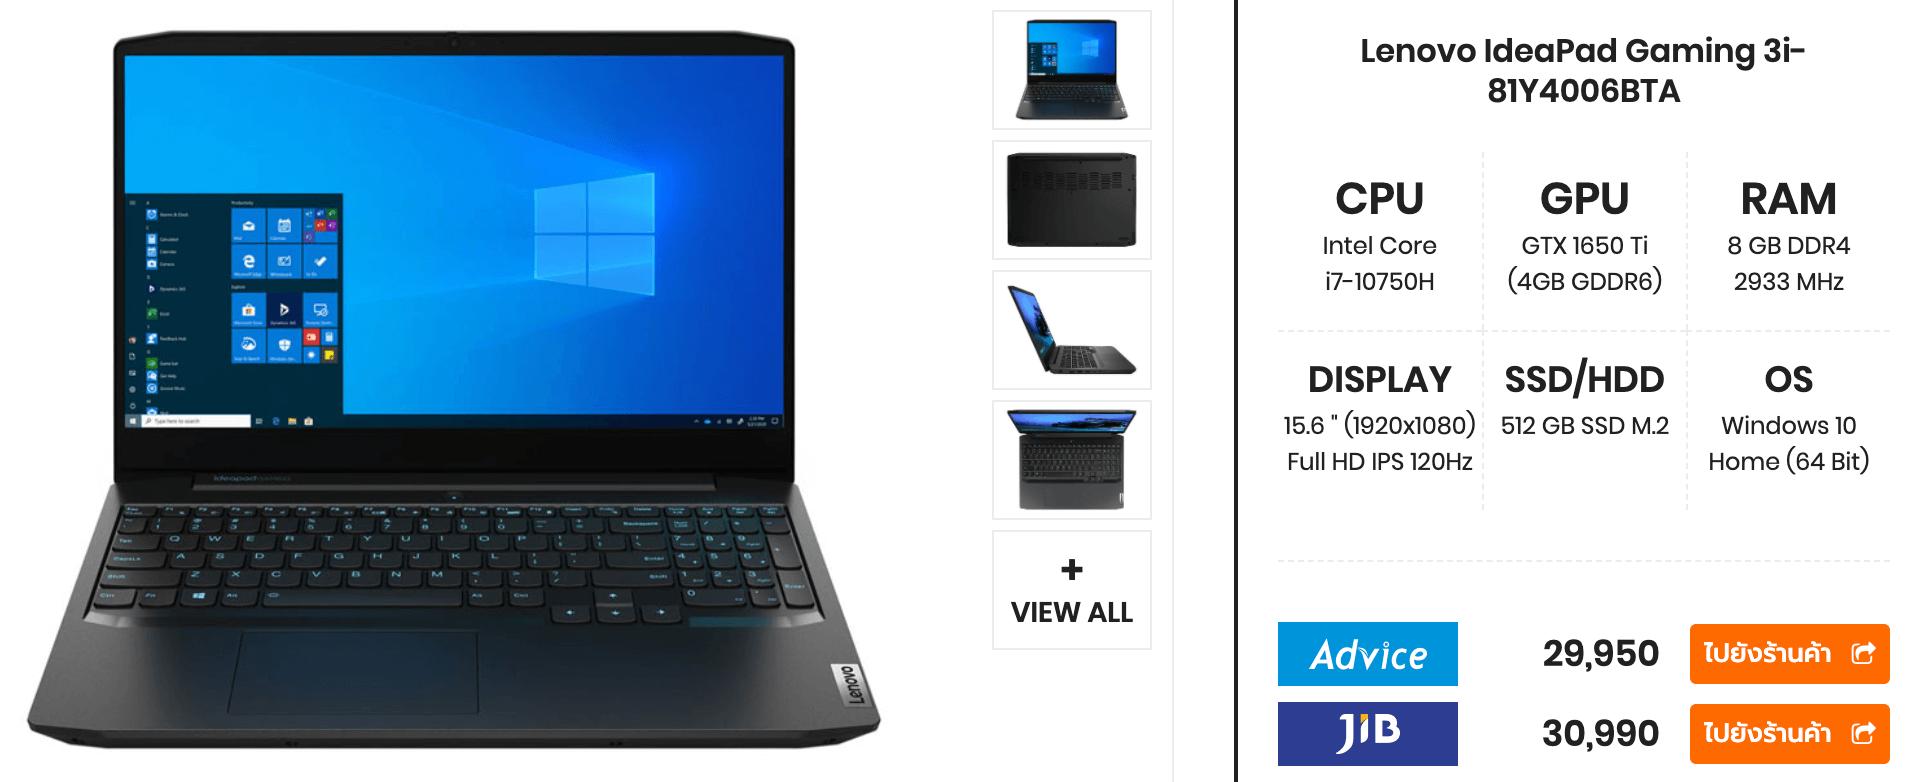 Lenovo IdeaPad Gaming 3i 81Y4006BTA